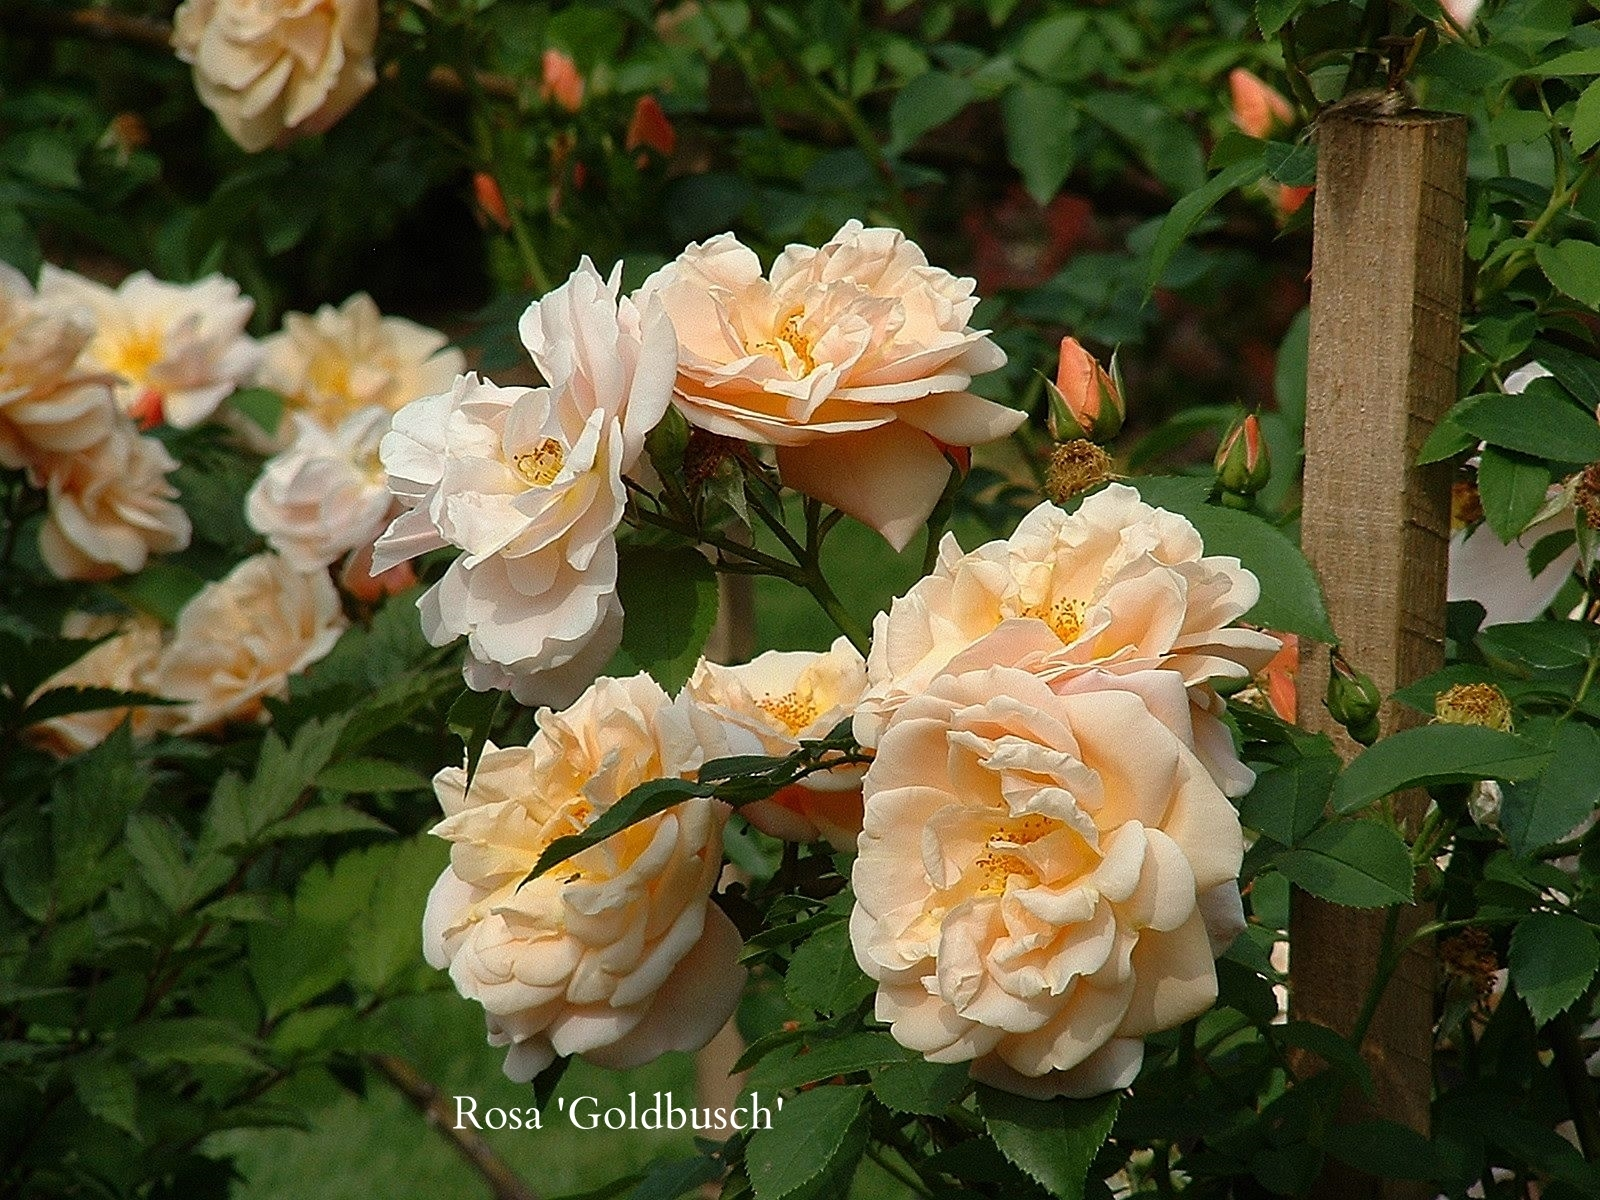 200606 rose 'Goldbusch' 2.JPG